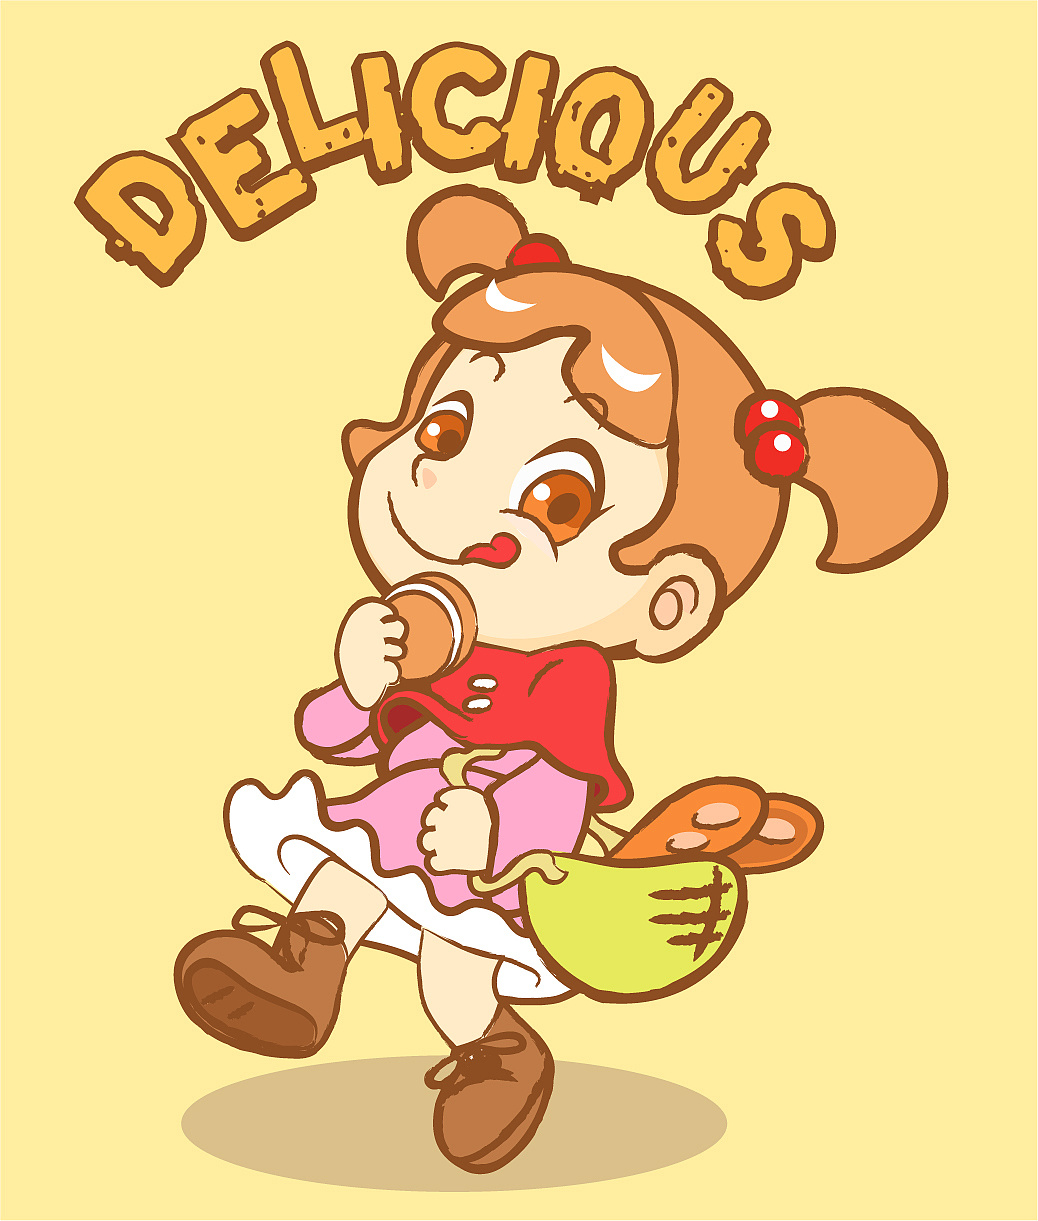 吃货小女孩